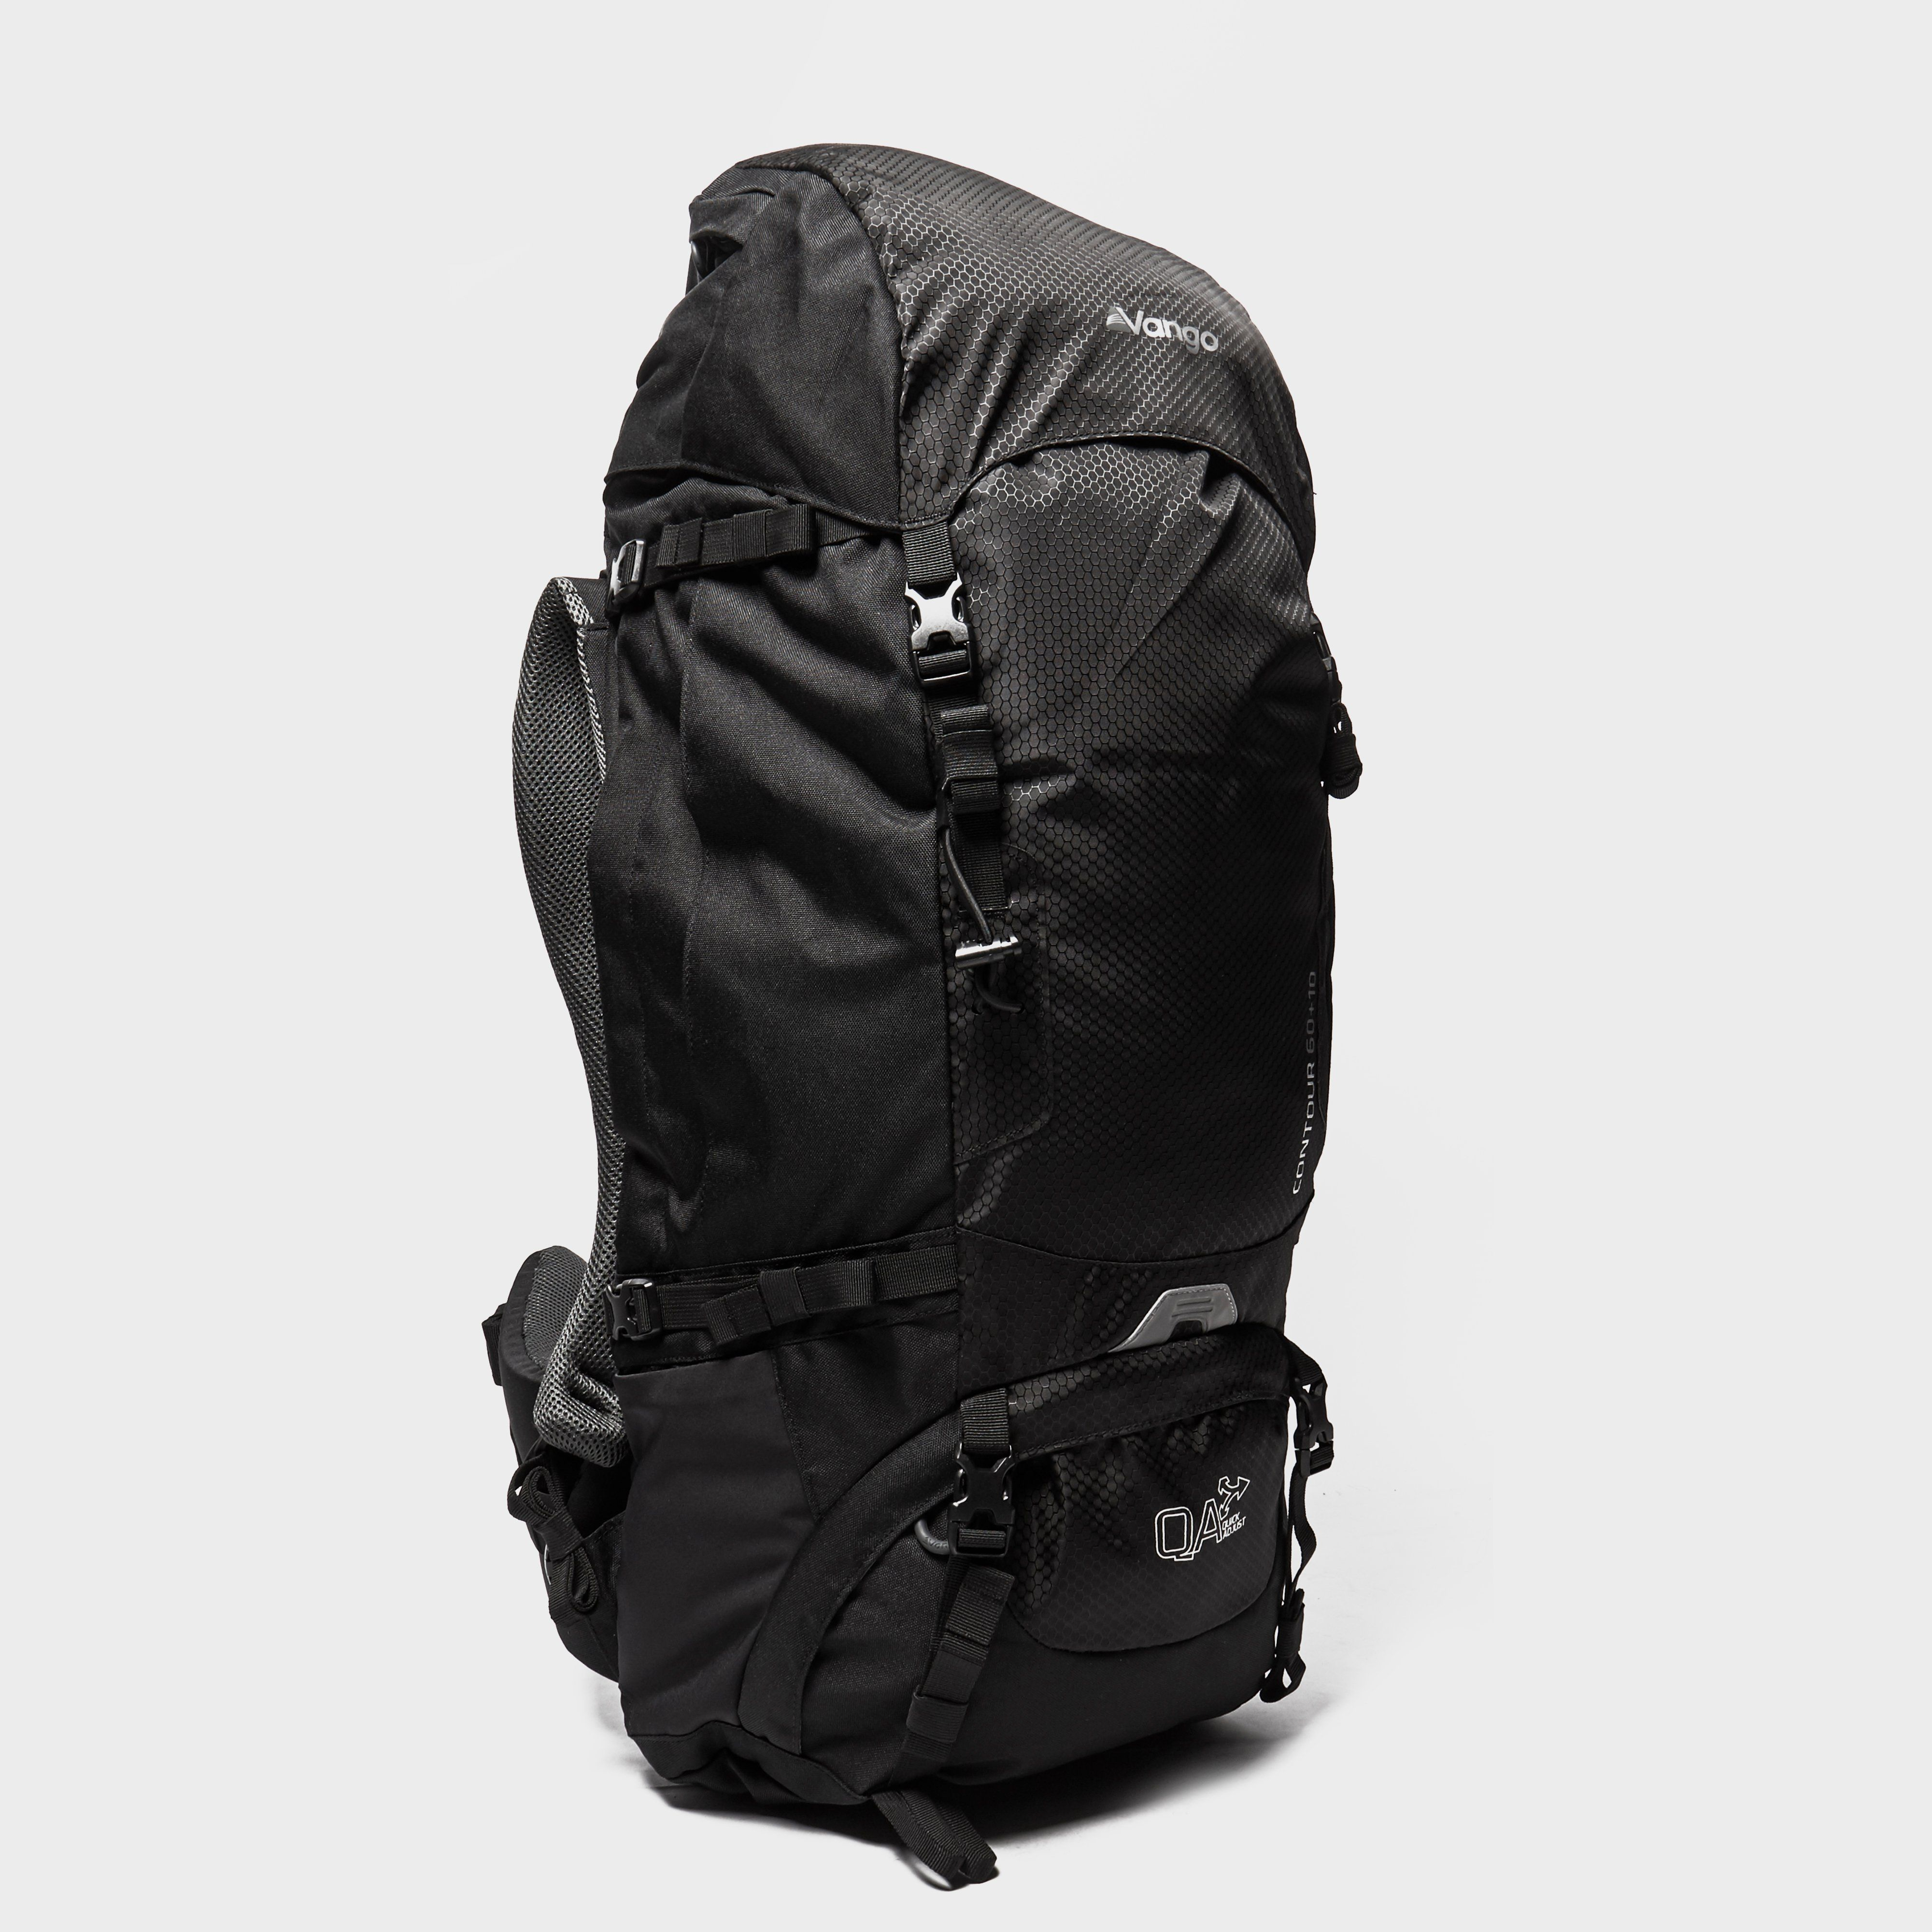 VANGO Contour 60+10 Rucksack